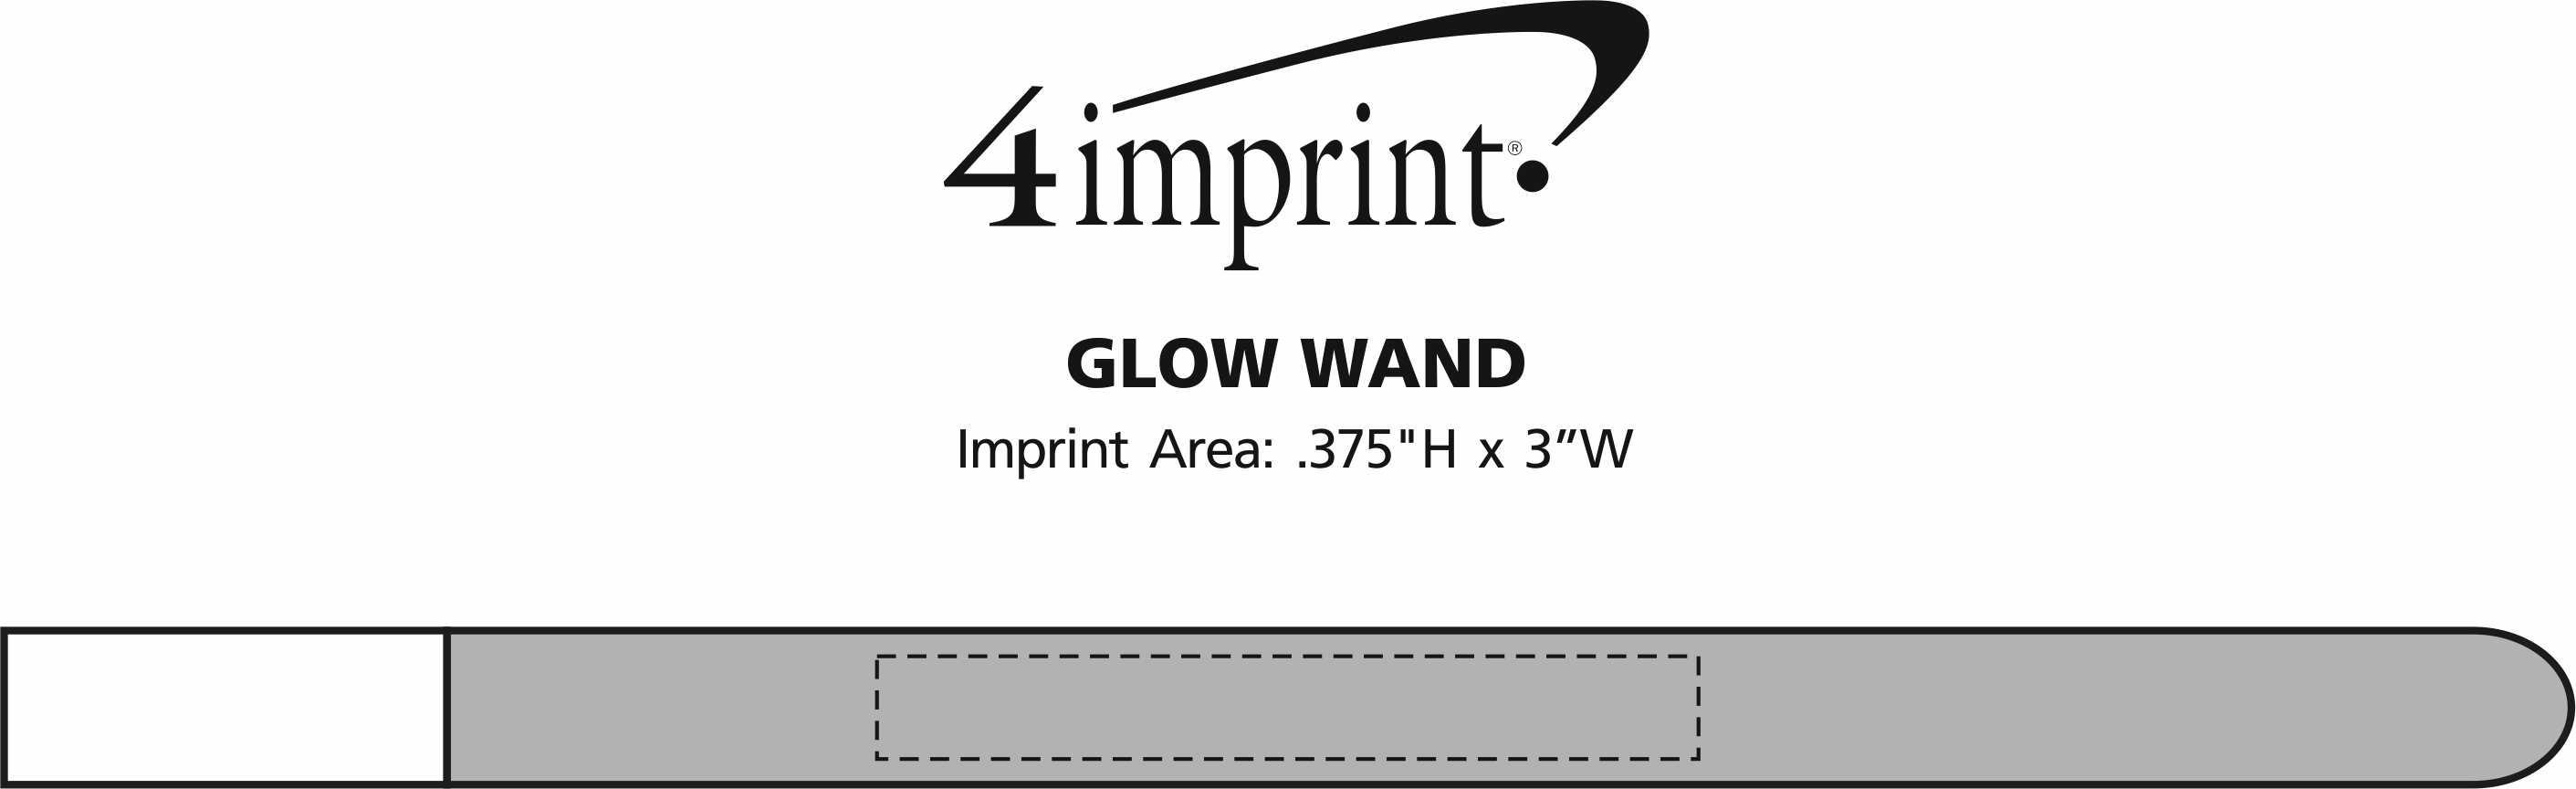 Imprint Area of Glow Wand